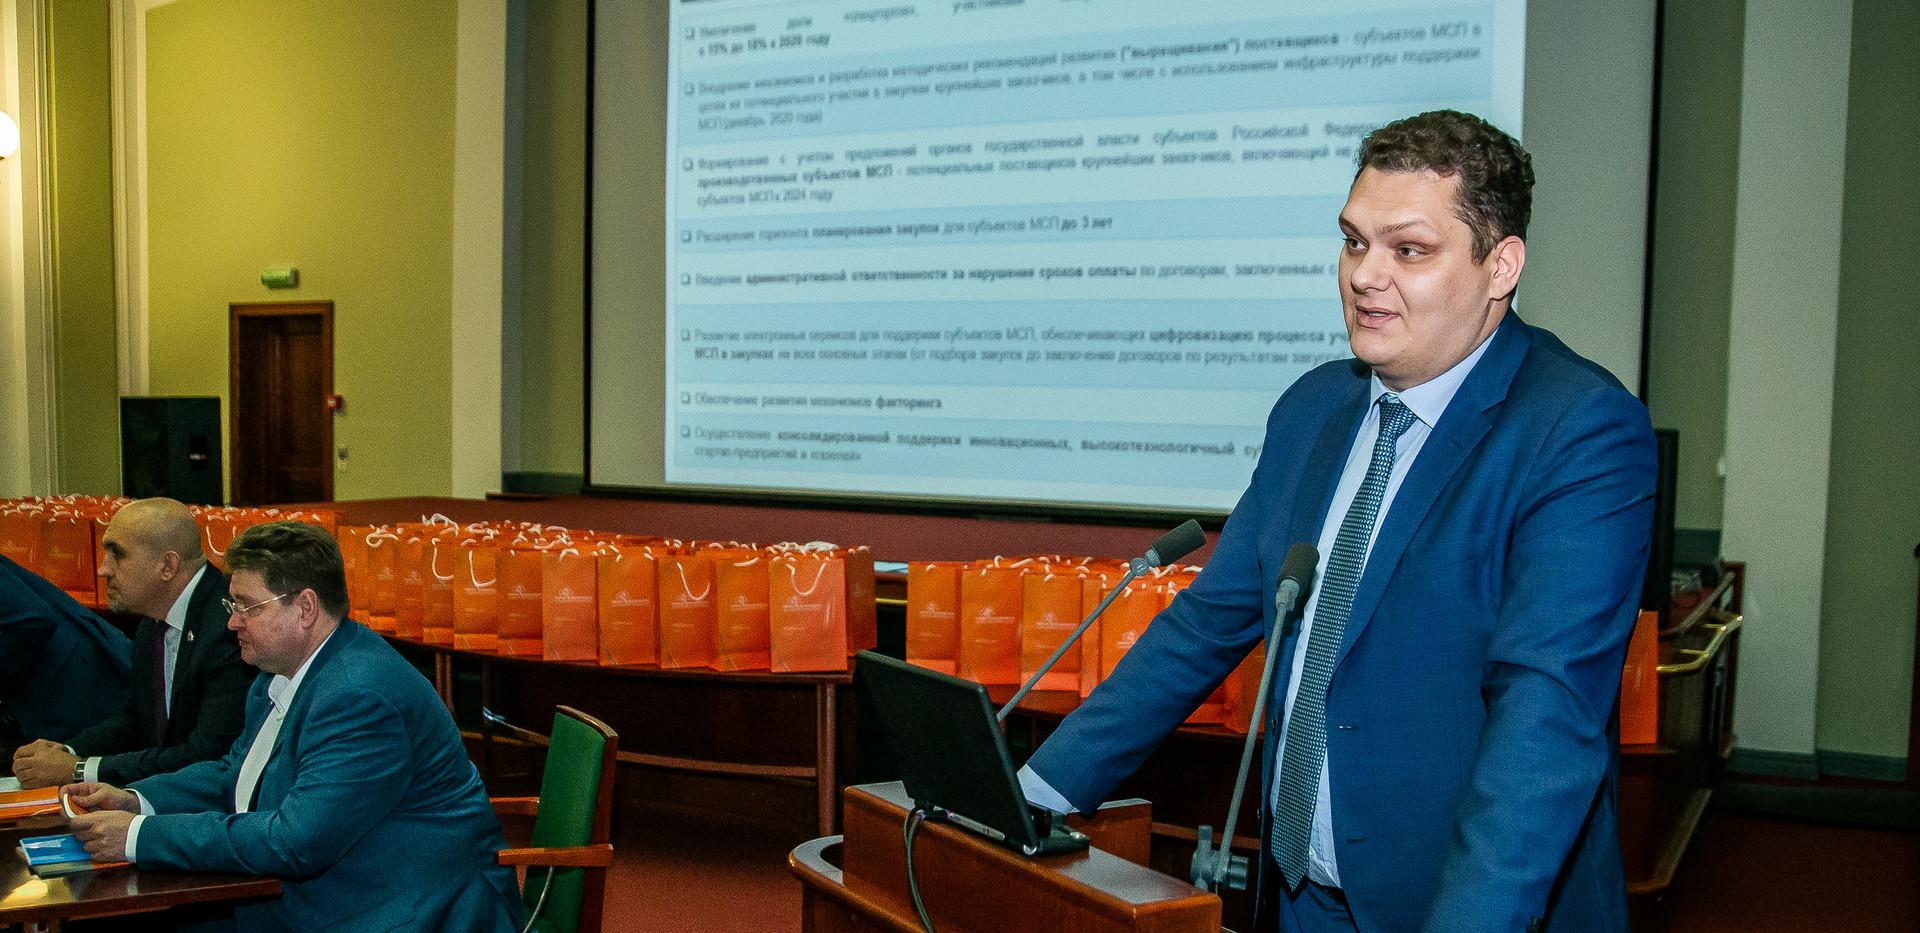 Доклады - 2 - Корпорация МСП - Машков В.